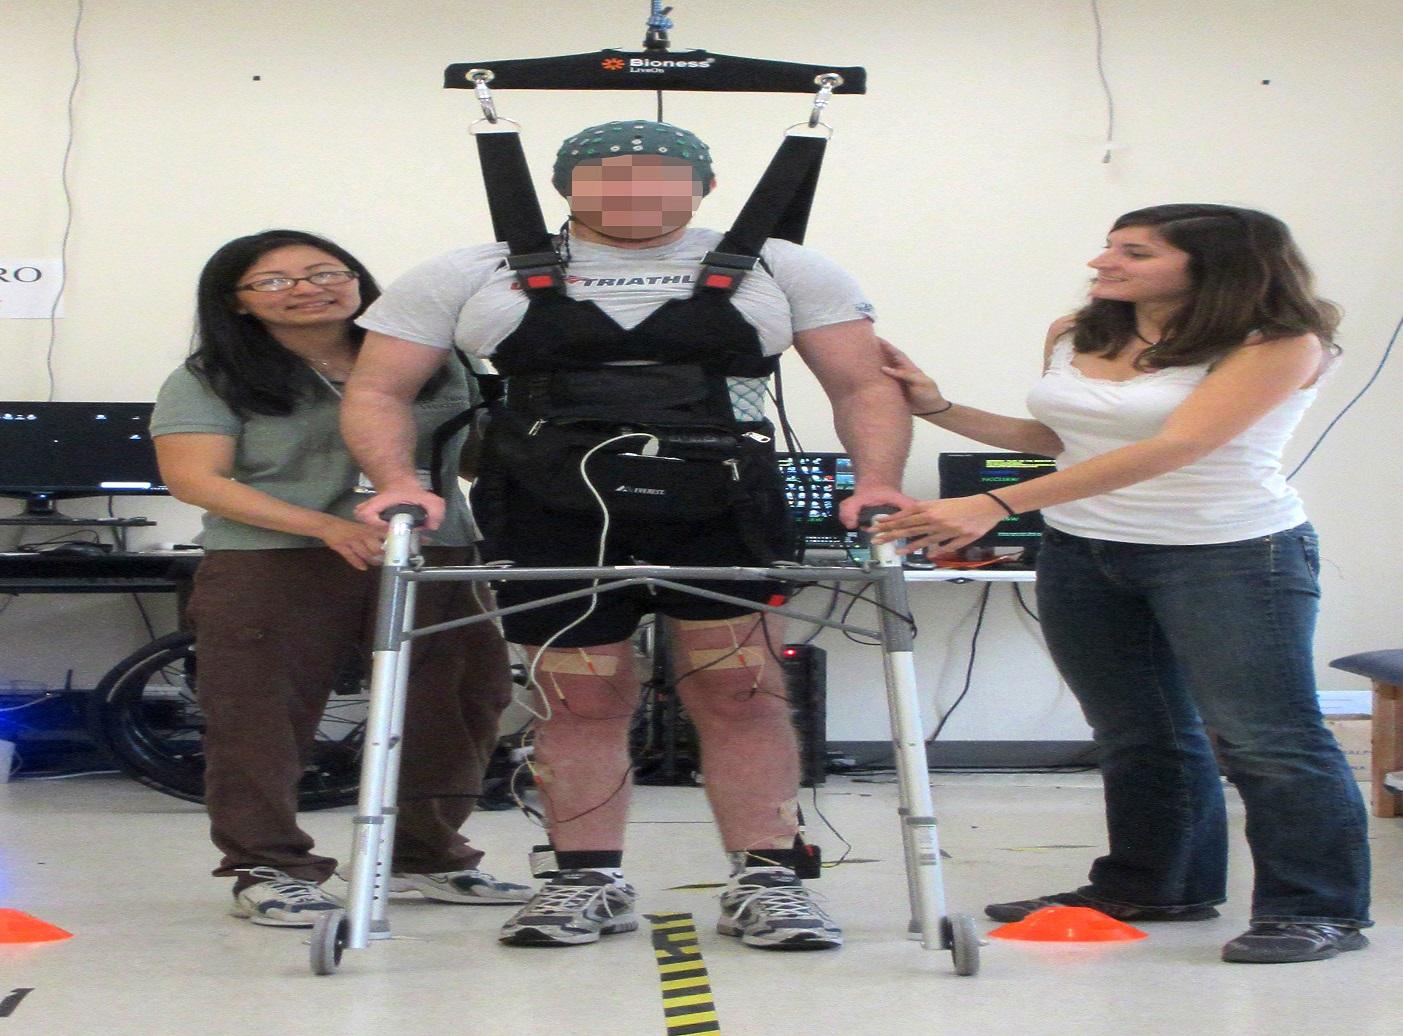 Paraplegico torna a camminare dopo dieci anni grazie a una tuta bionica